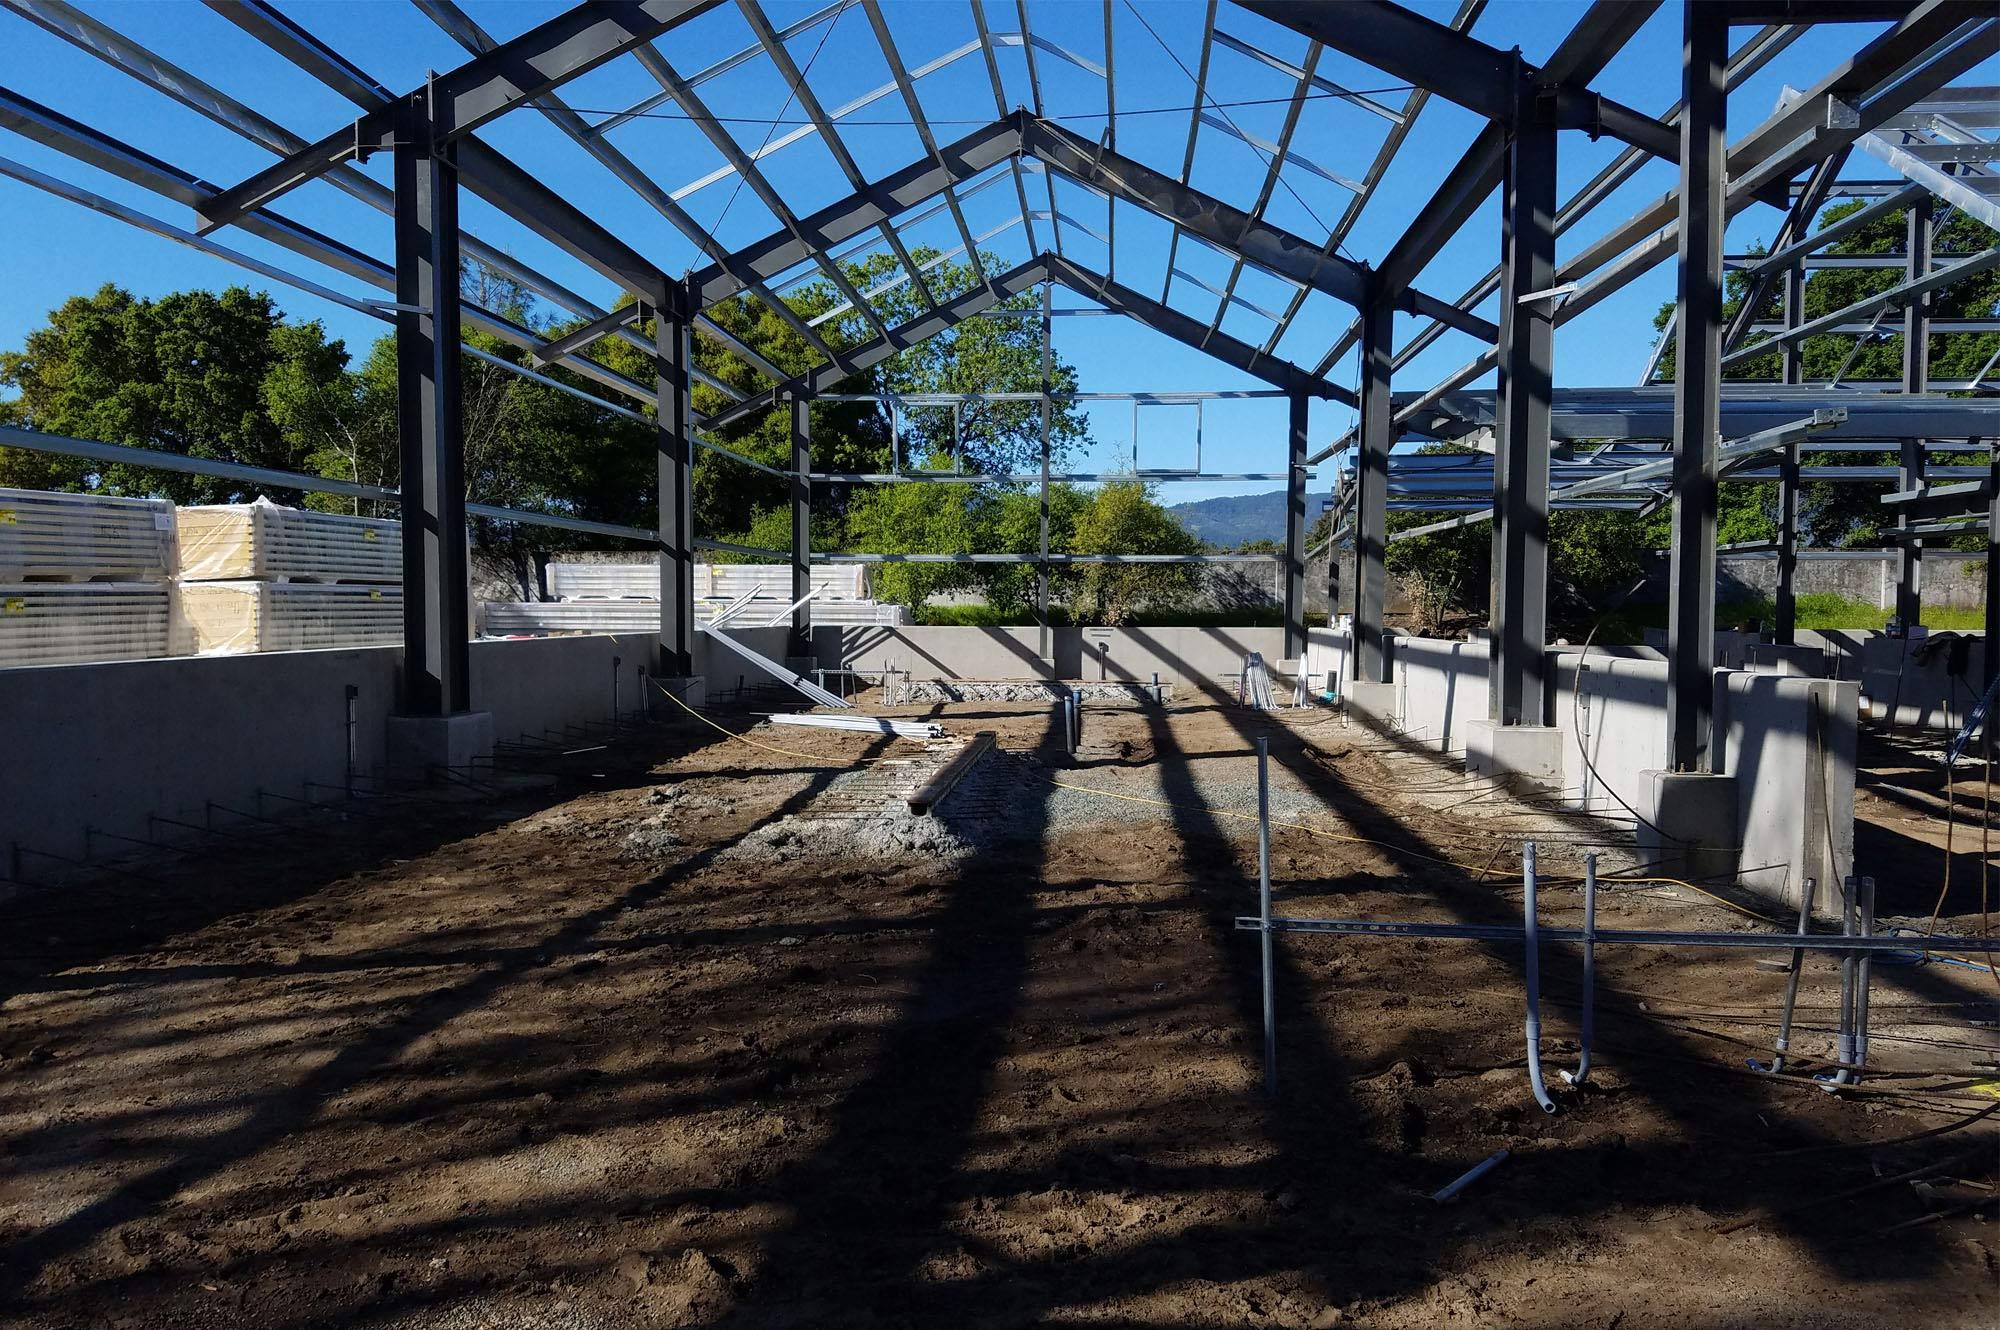 Dakota Shy Winery Construction in Progress